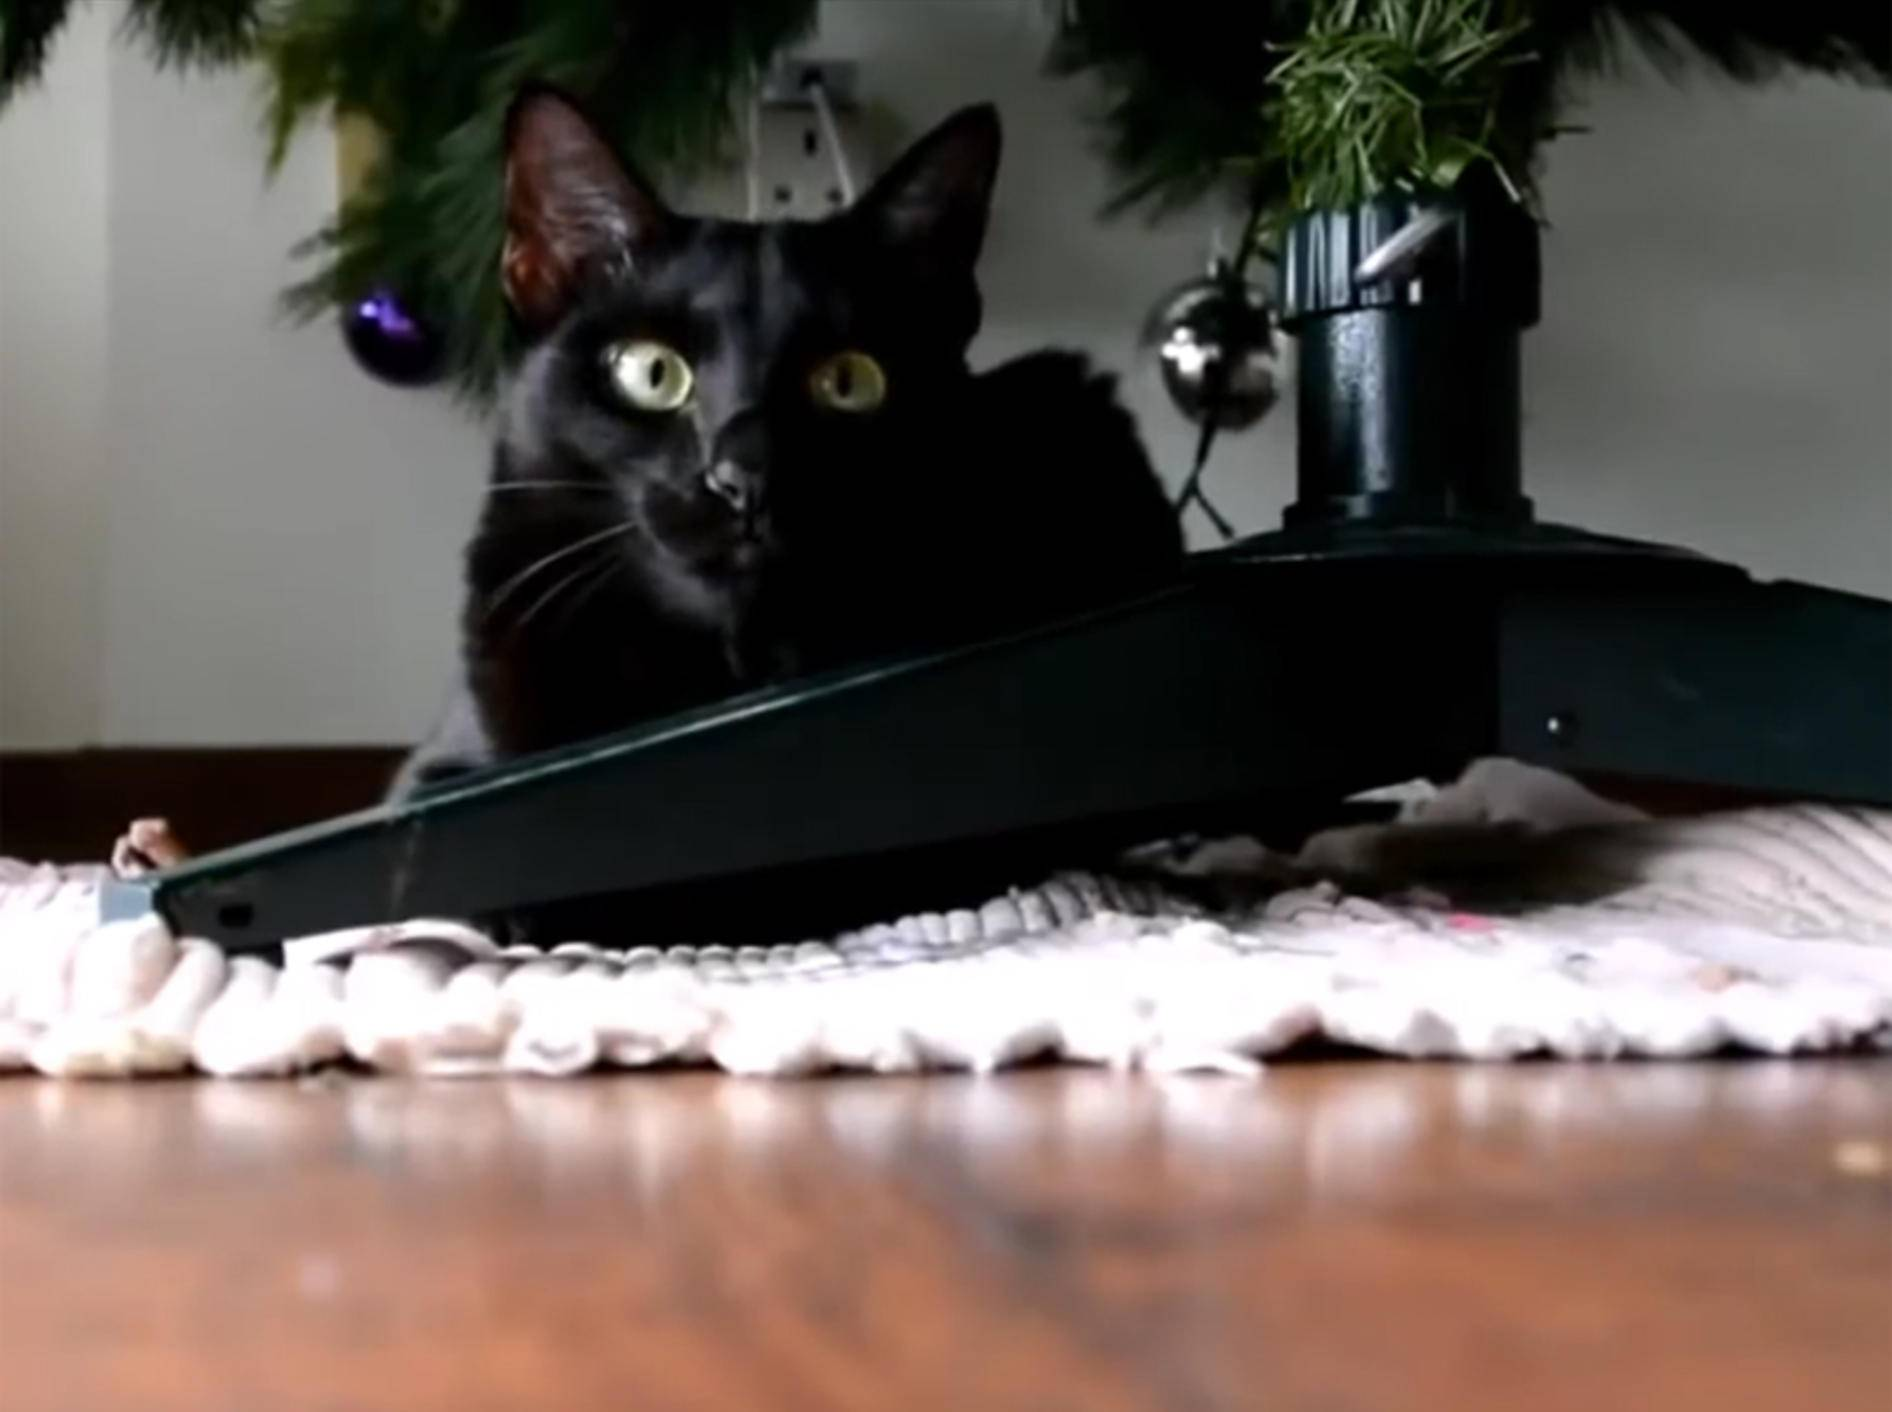 Katzen vs. Weihnachtsbaum: Attackeee! – YouTube / Animalz TV